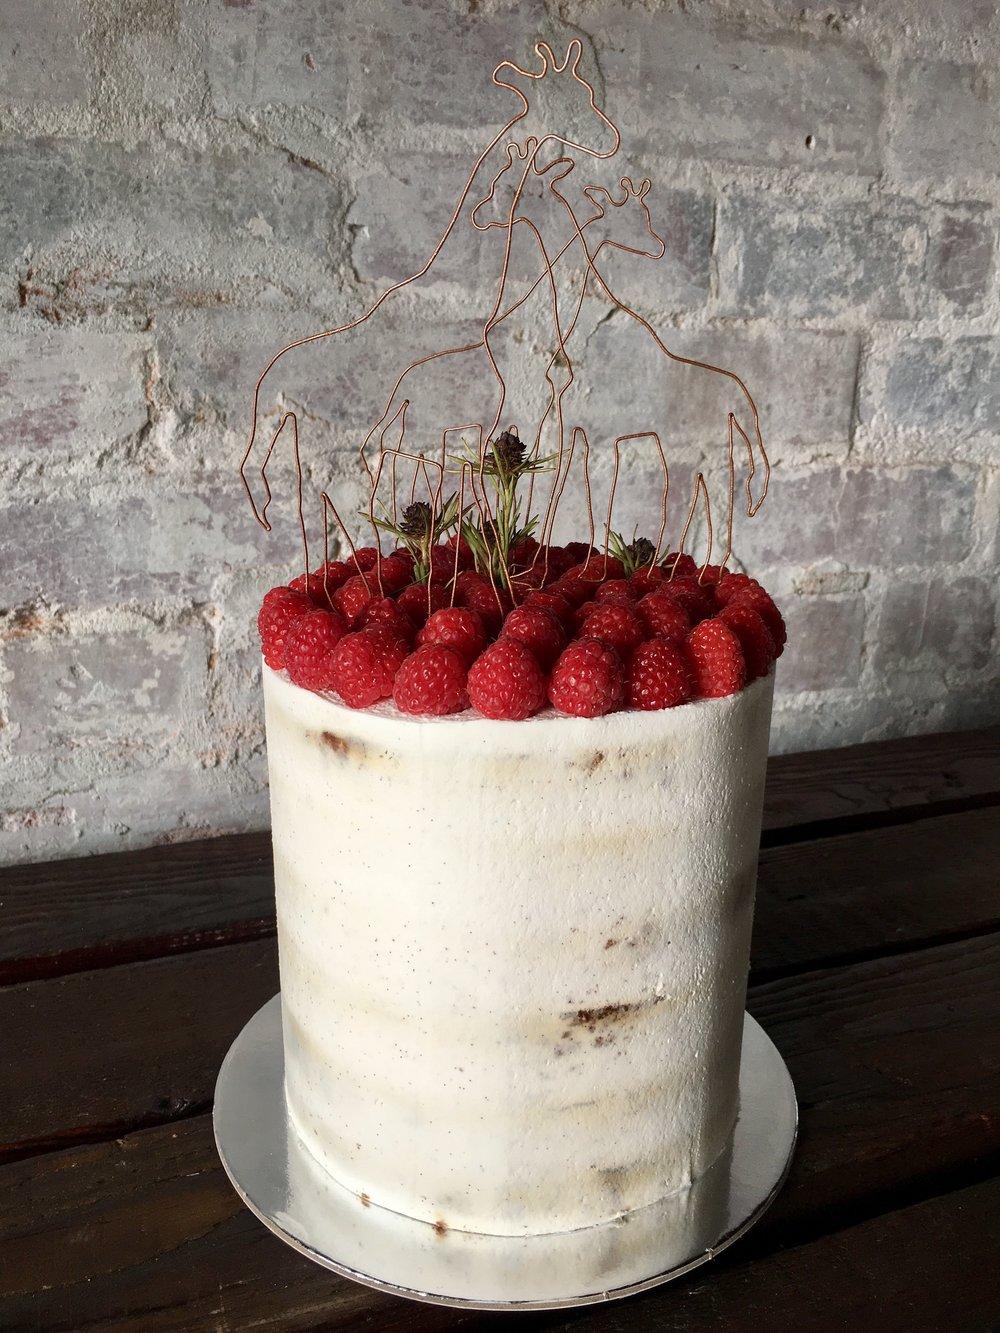 Hazelnut Raspberry - Hazelnut and chocolate truffle cake, with vegan coconut creme, fresh raspberries and floral arrangement. Semi naked exterior. In house made wire giraffe.